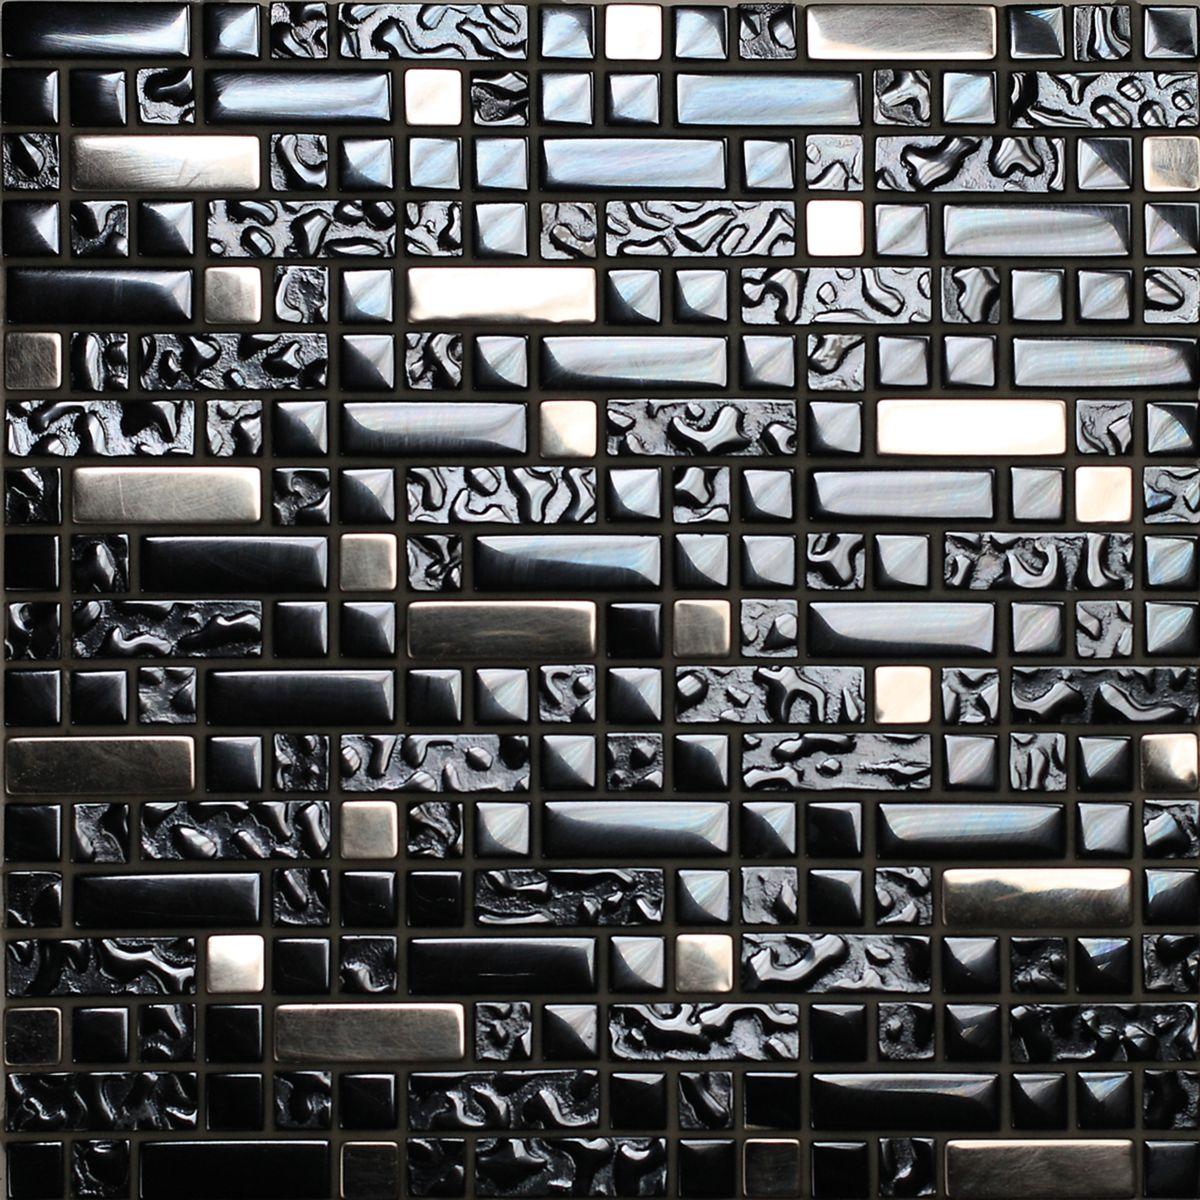 Mosaico City 33,5 x 29 cm nero, argento, oro: prezzi e offerte online